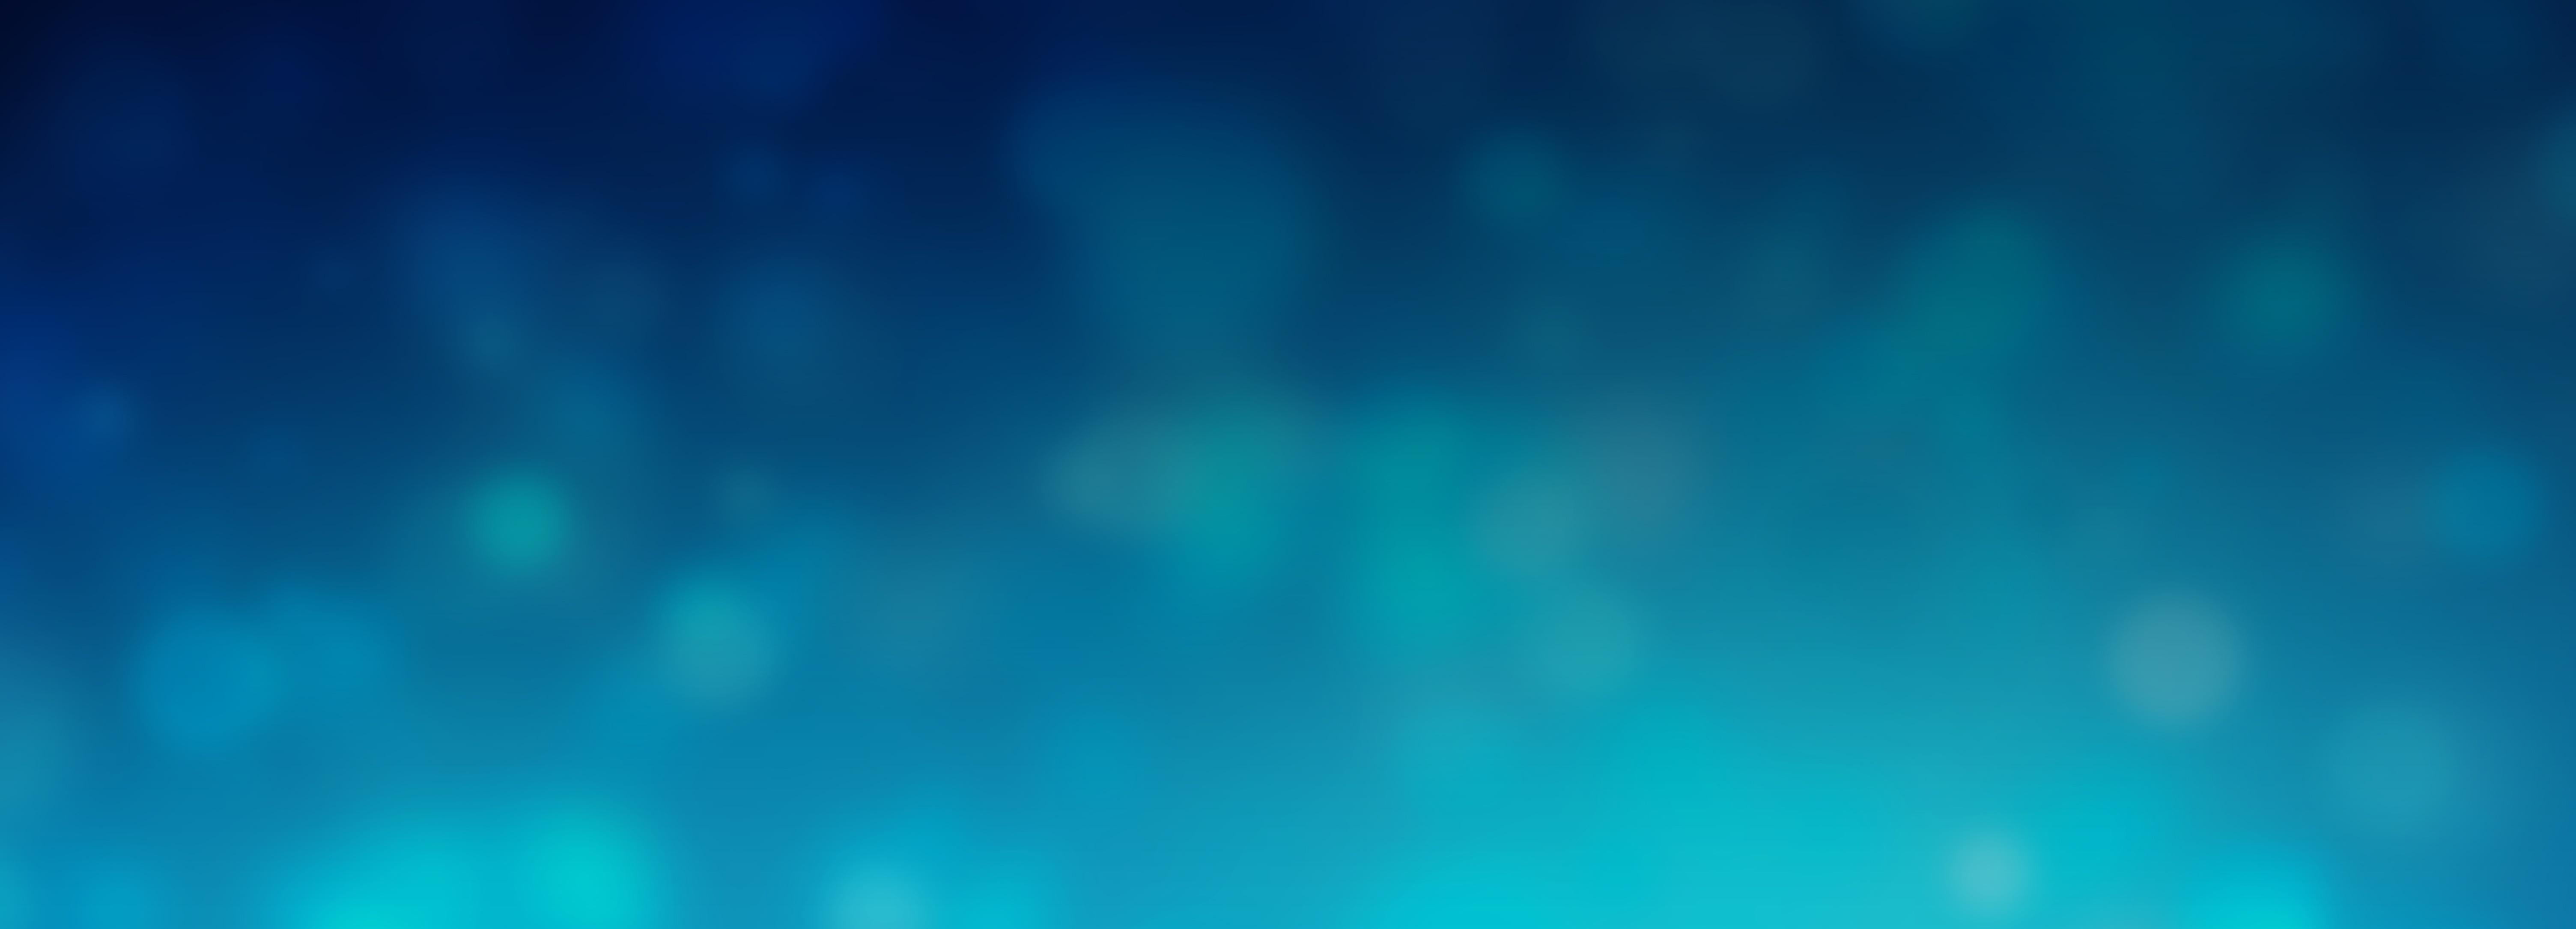 Blue-Blur.jpg